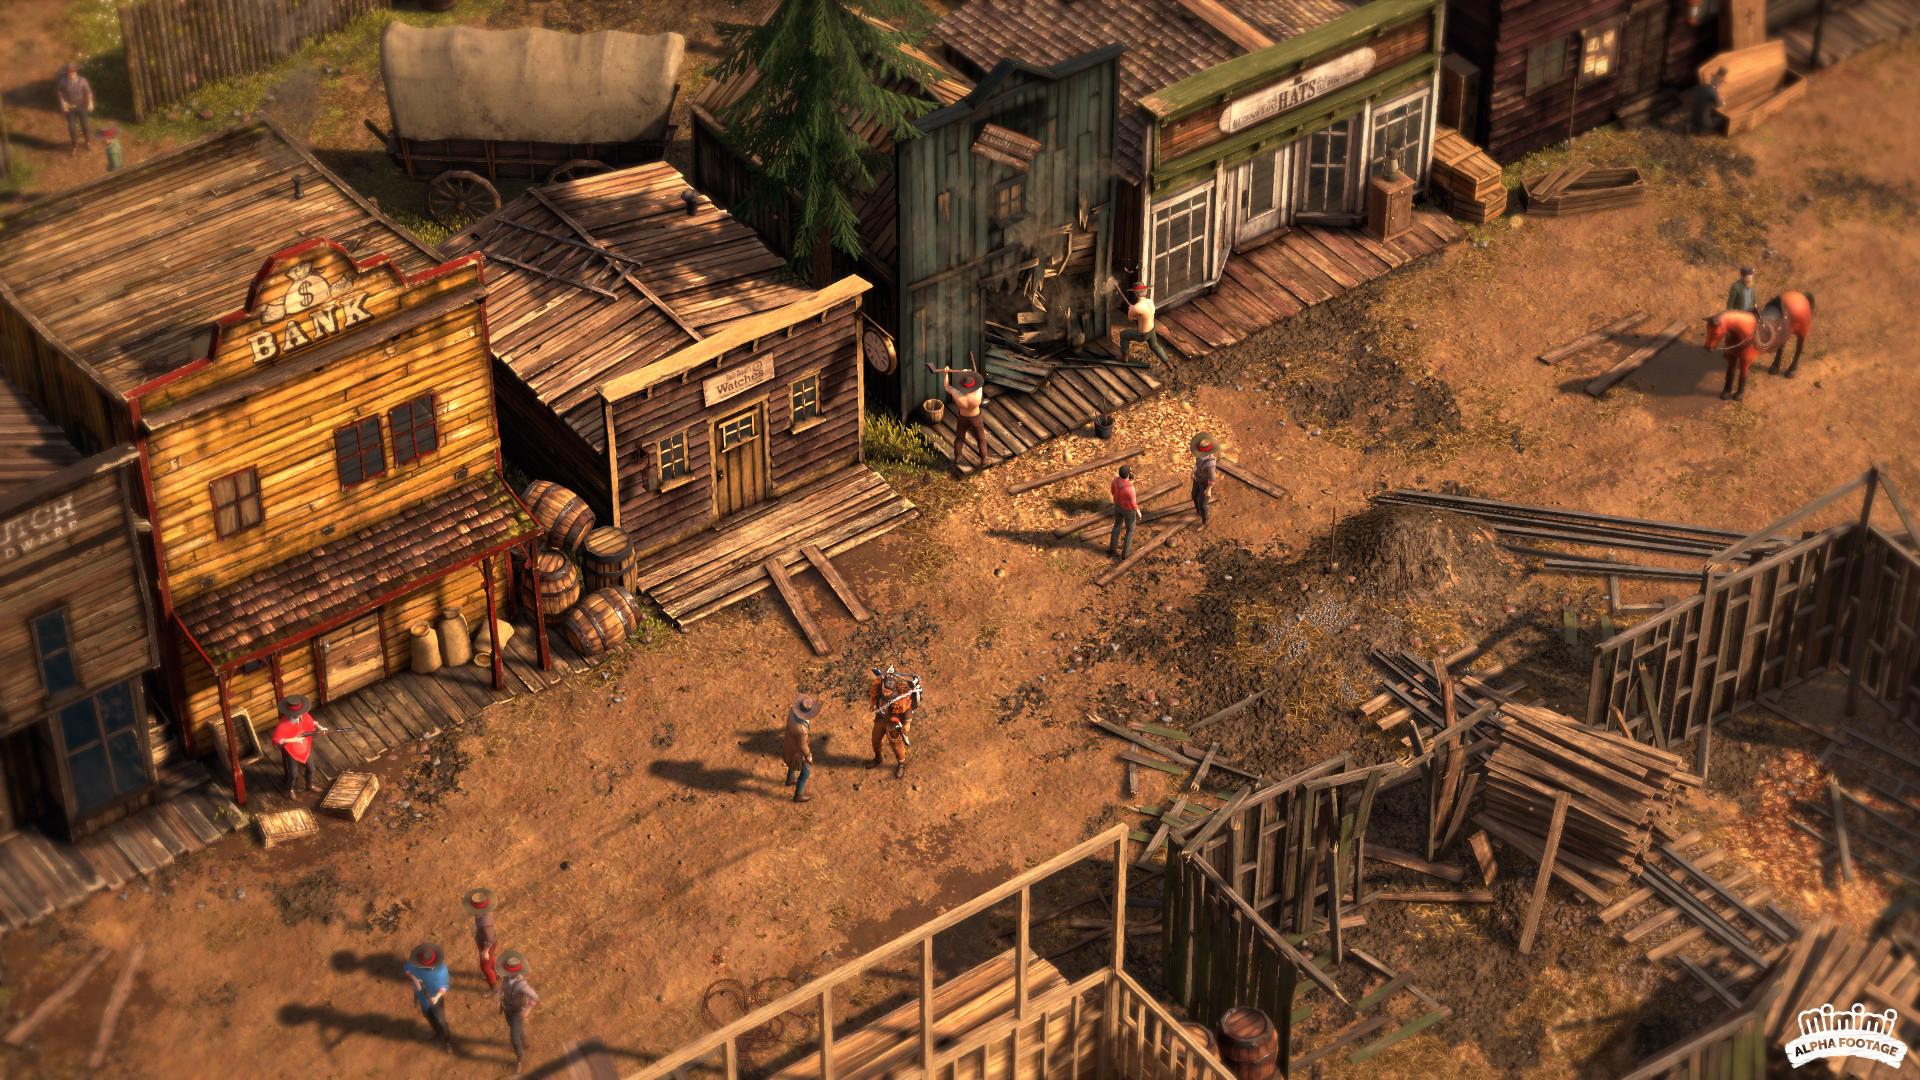 Desperados Iii For Xbox One Game Reviews